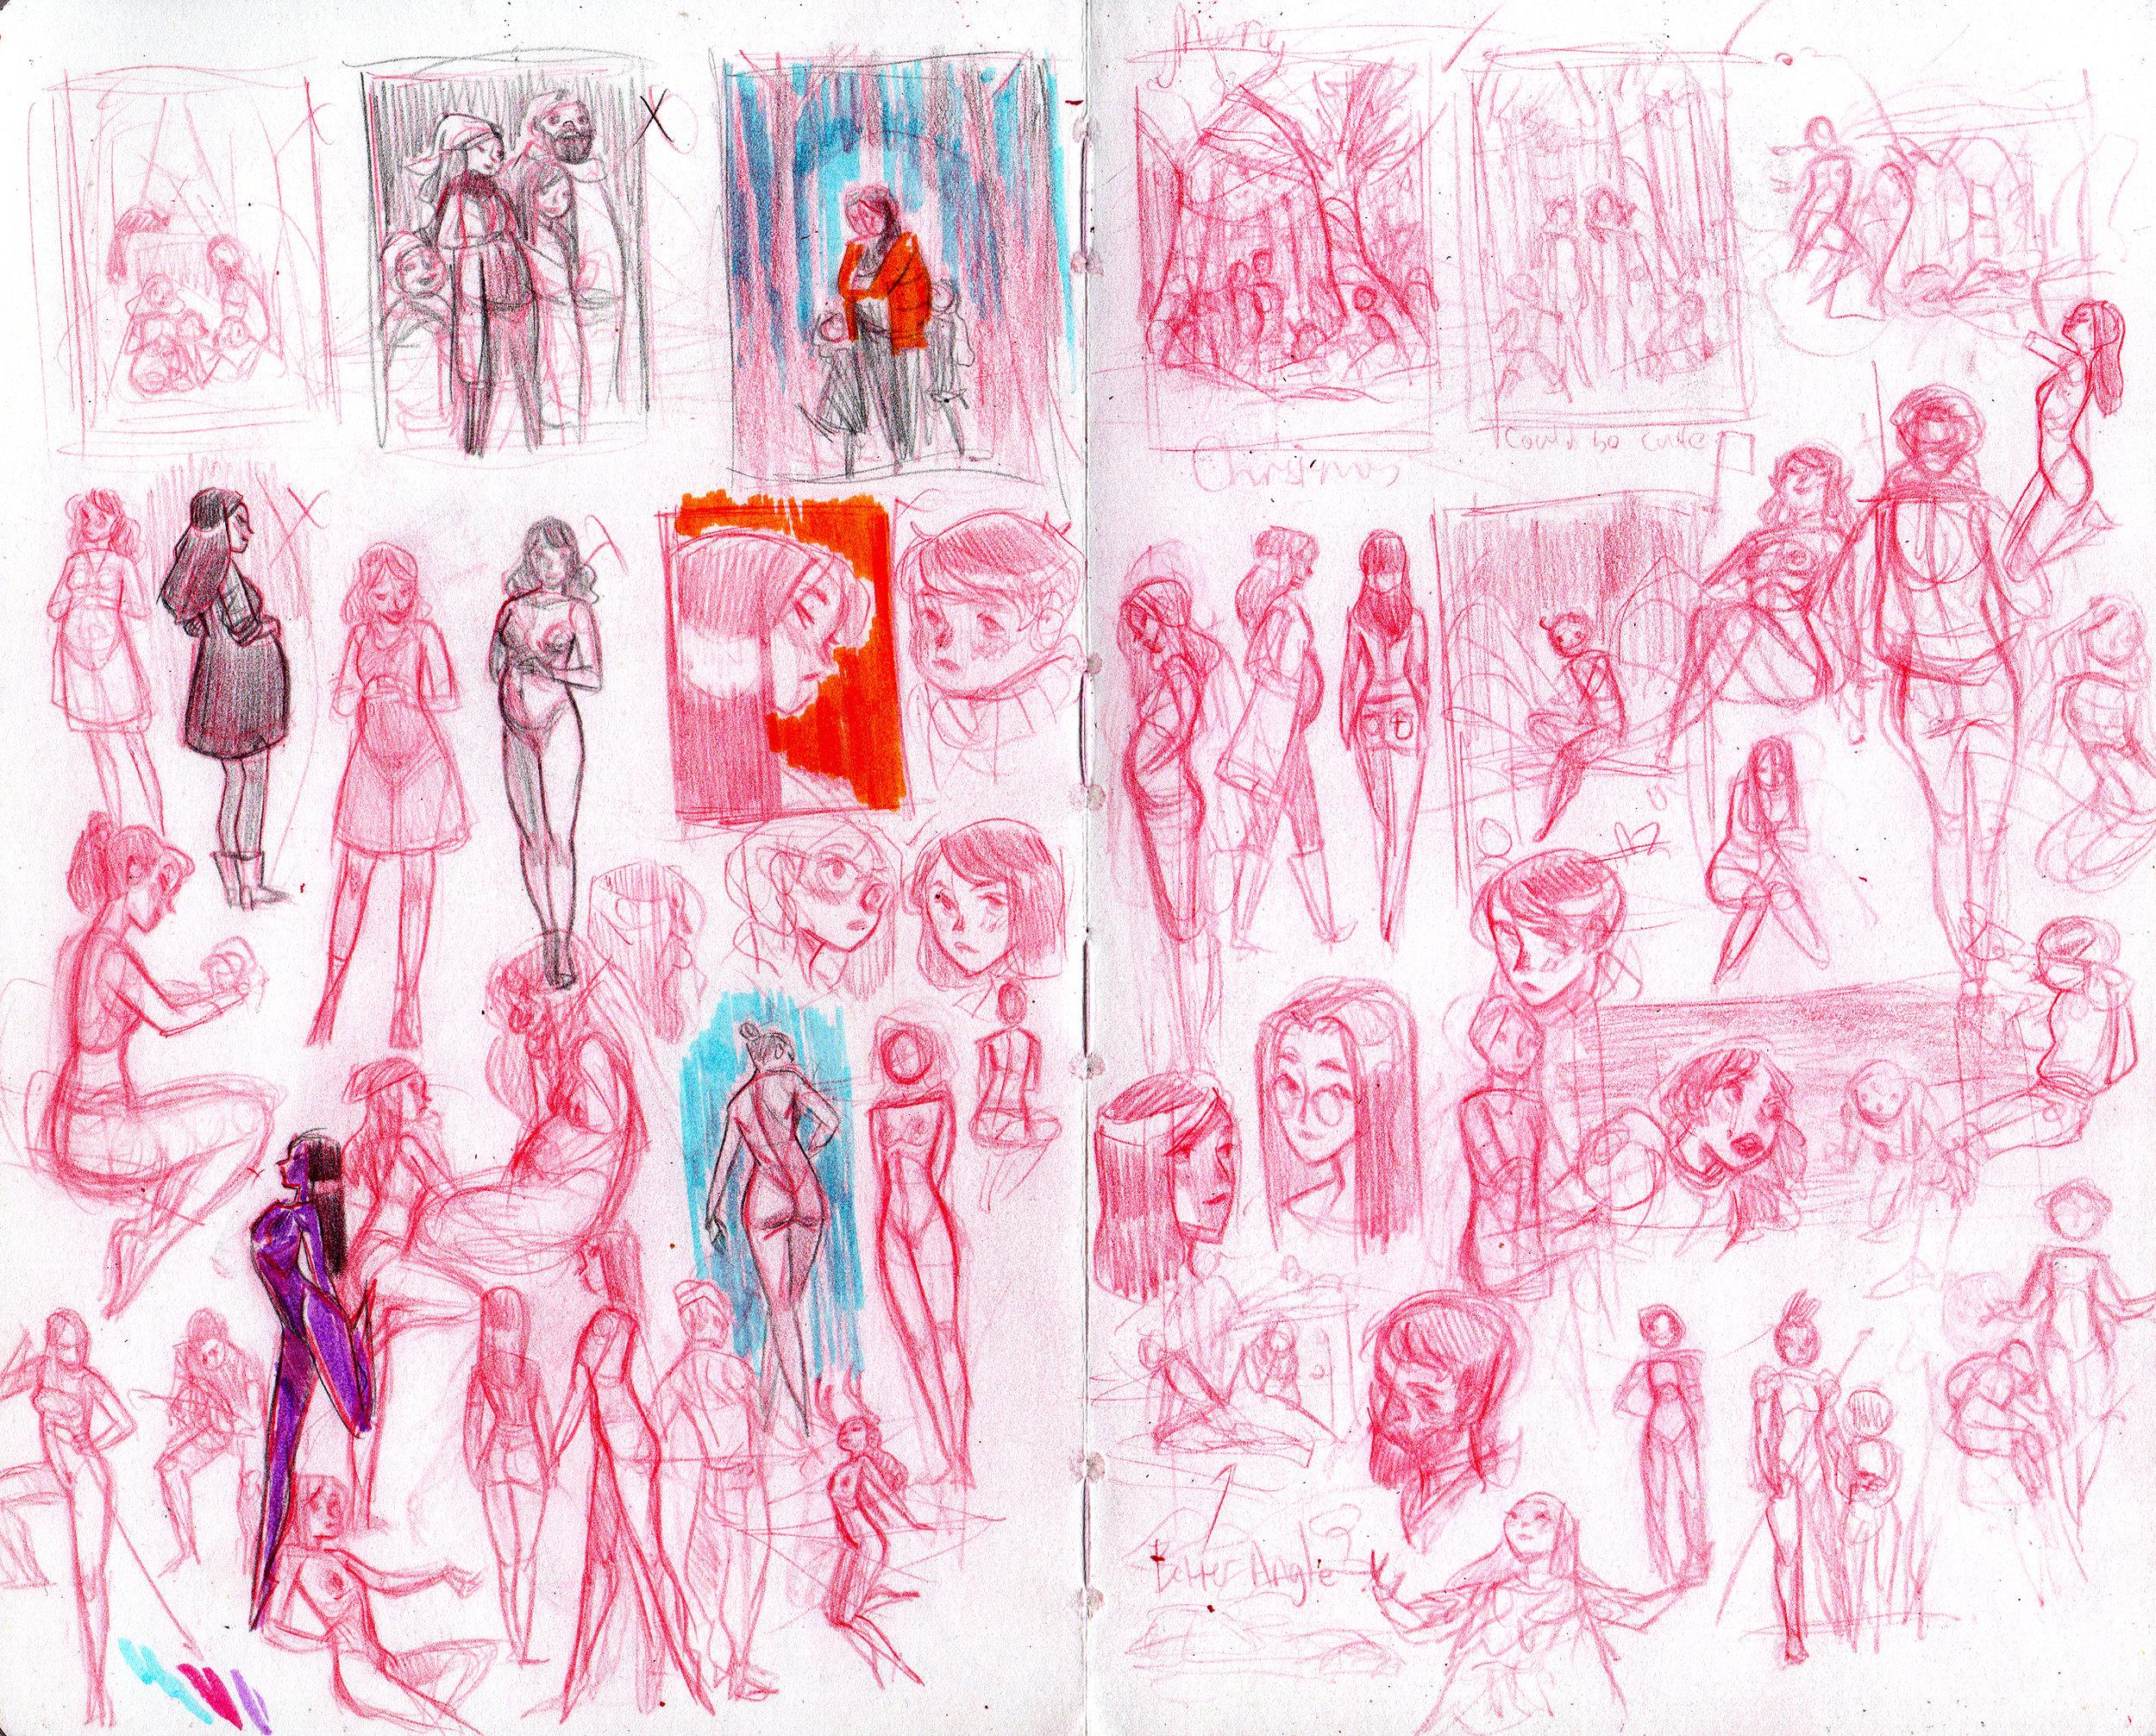 winter2018_2019 sketches2.jpg